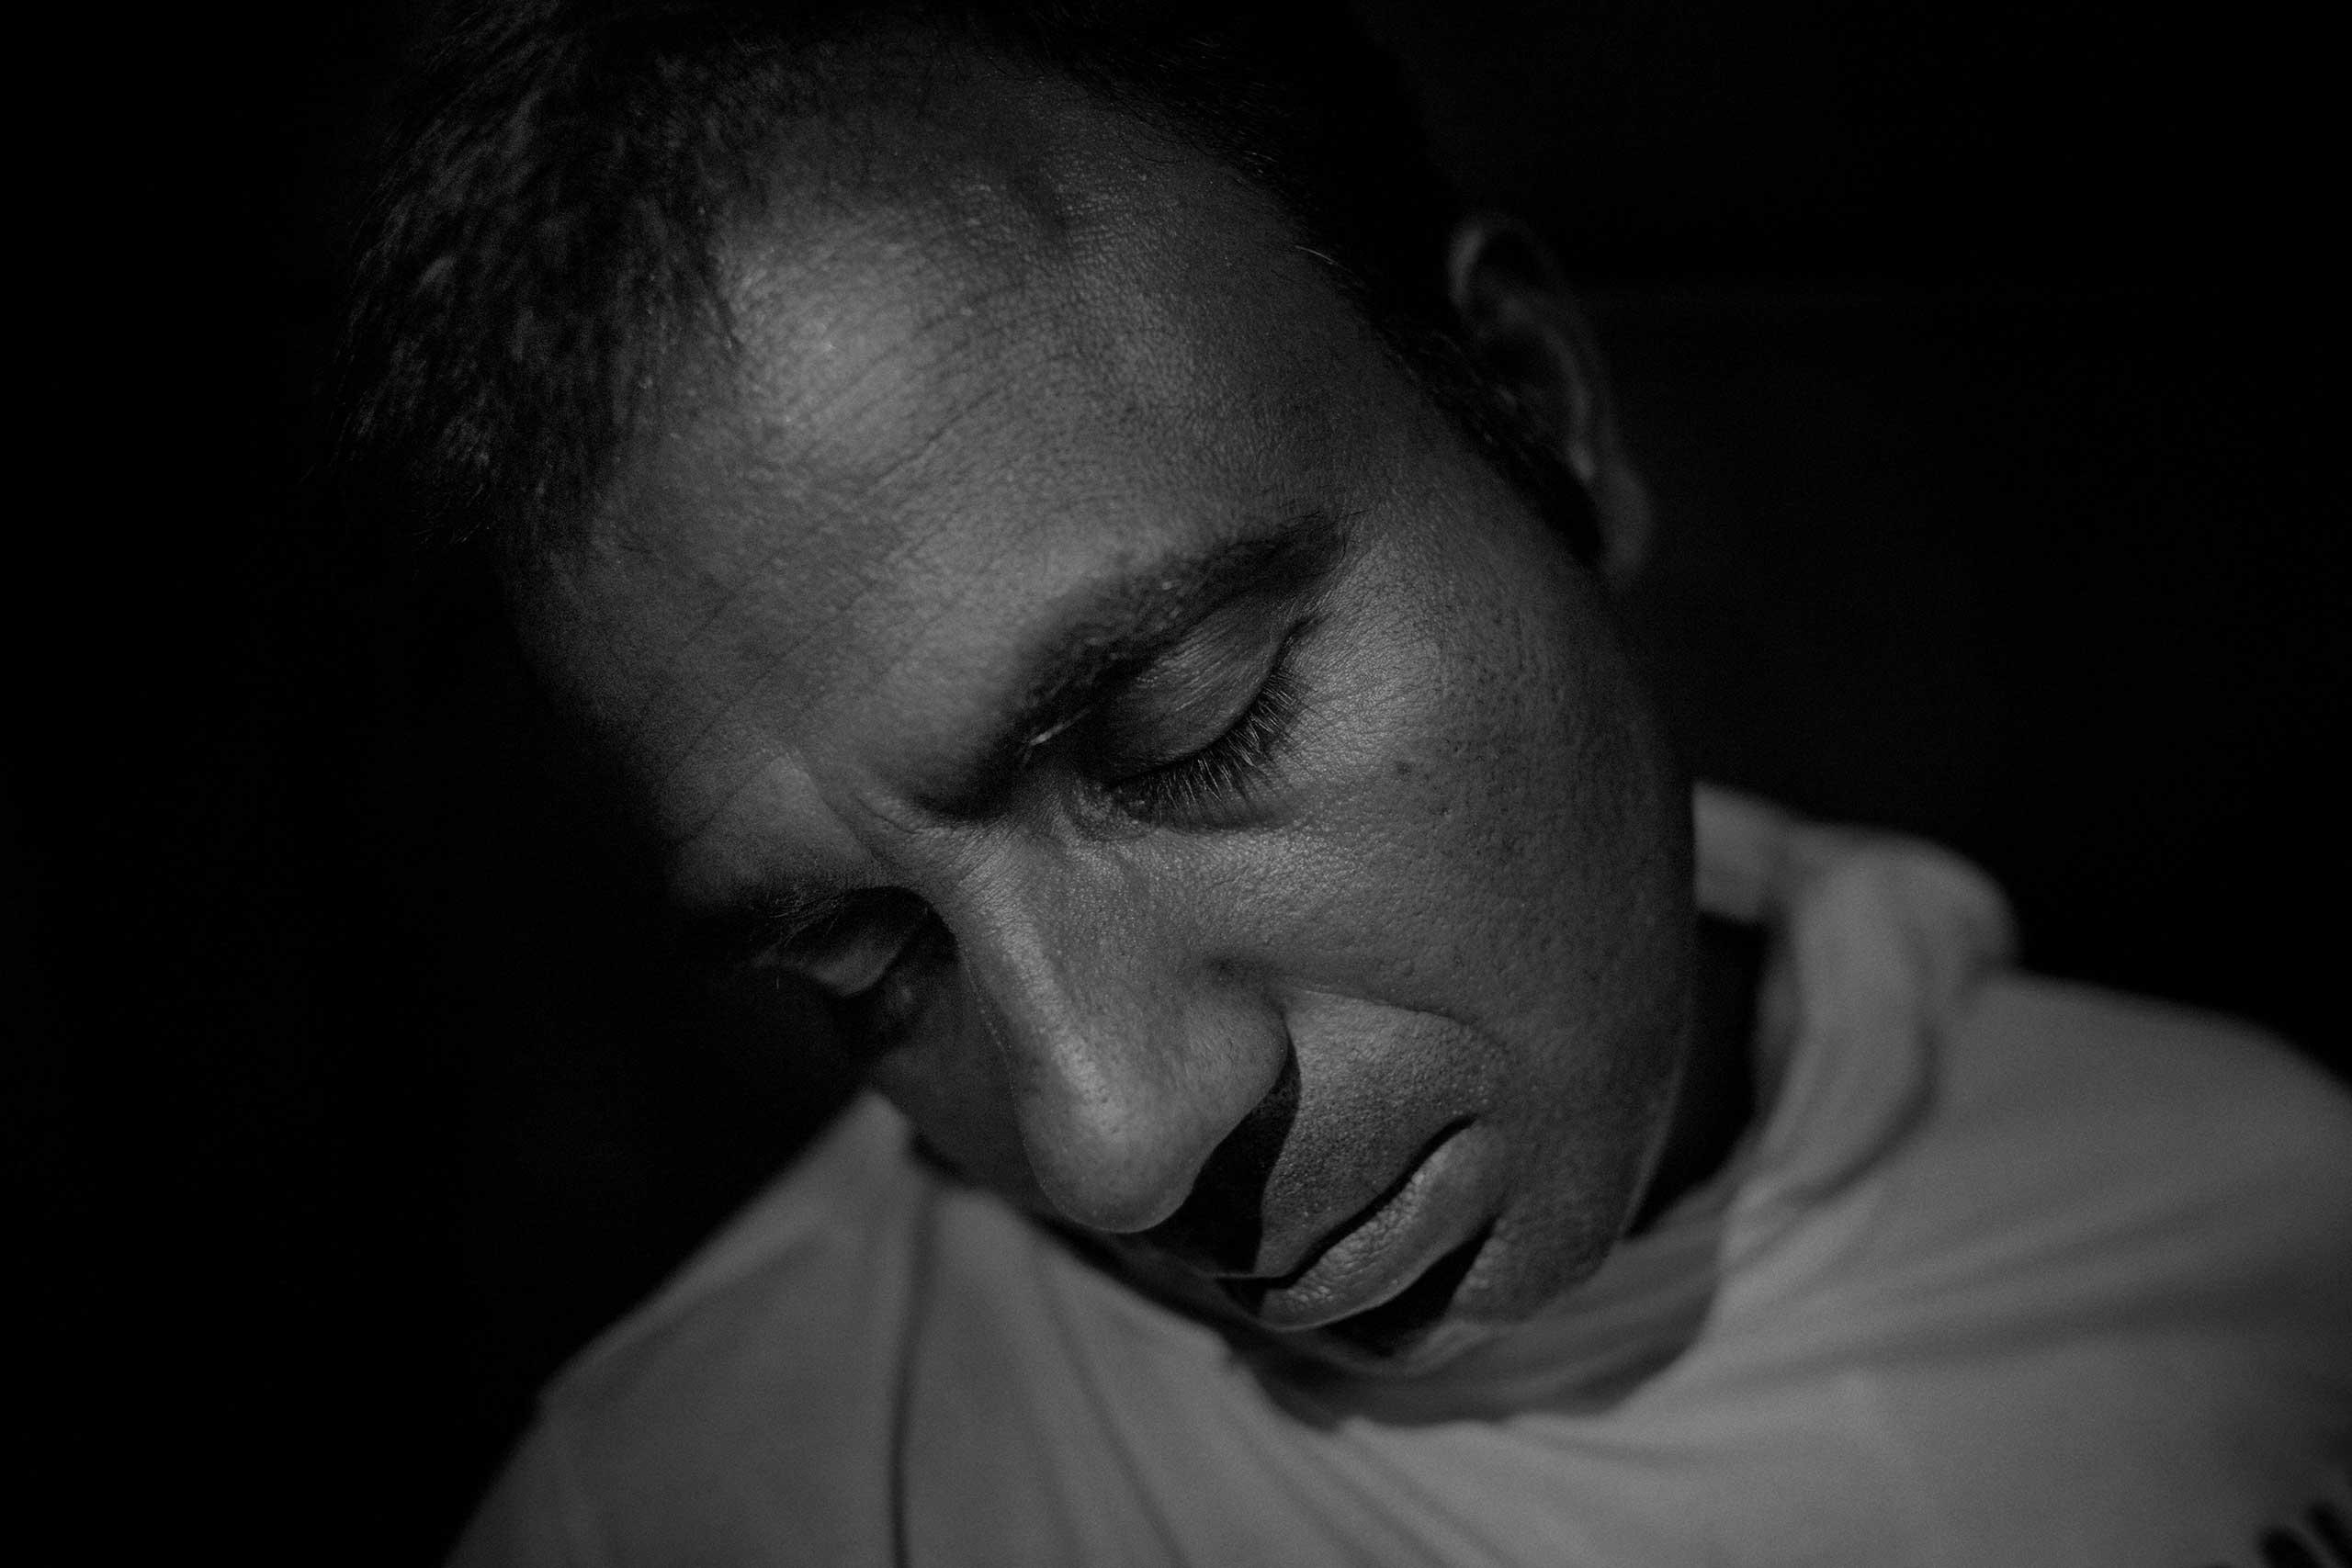 A man from Bangladesh sleeps on the local train, traveling from Gevdelija on the Macedonian-Greek border, to Tabanovce, on the Macedonian-Serbian border.